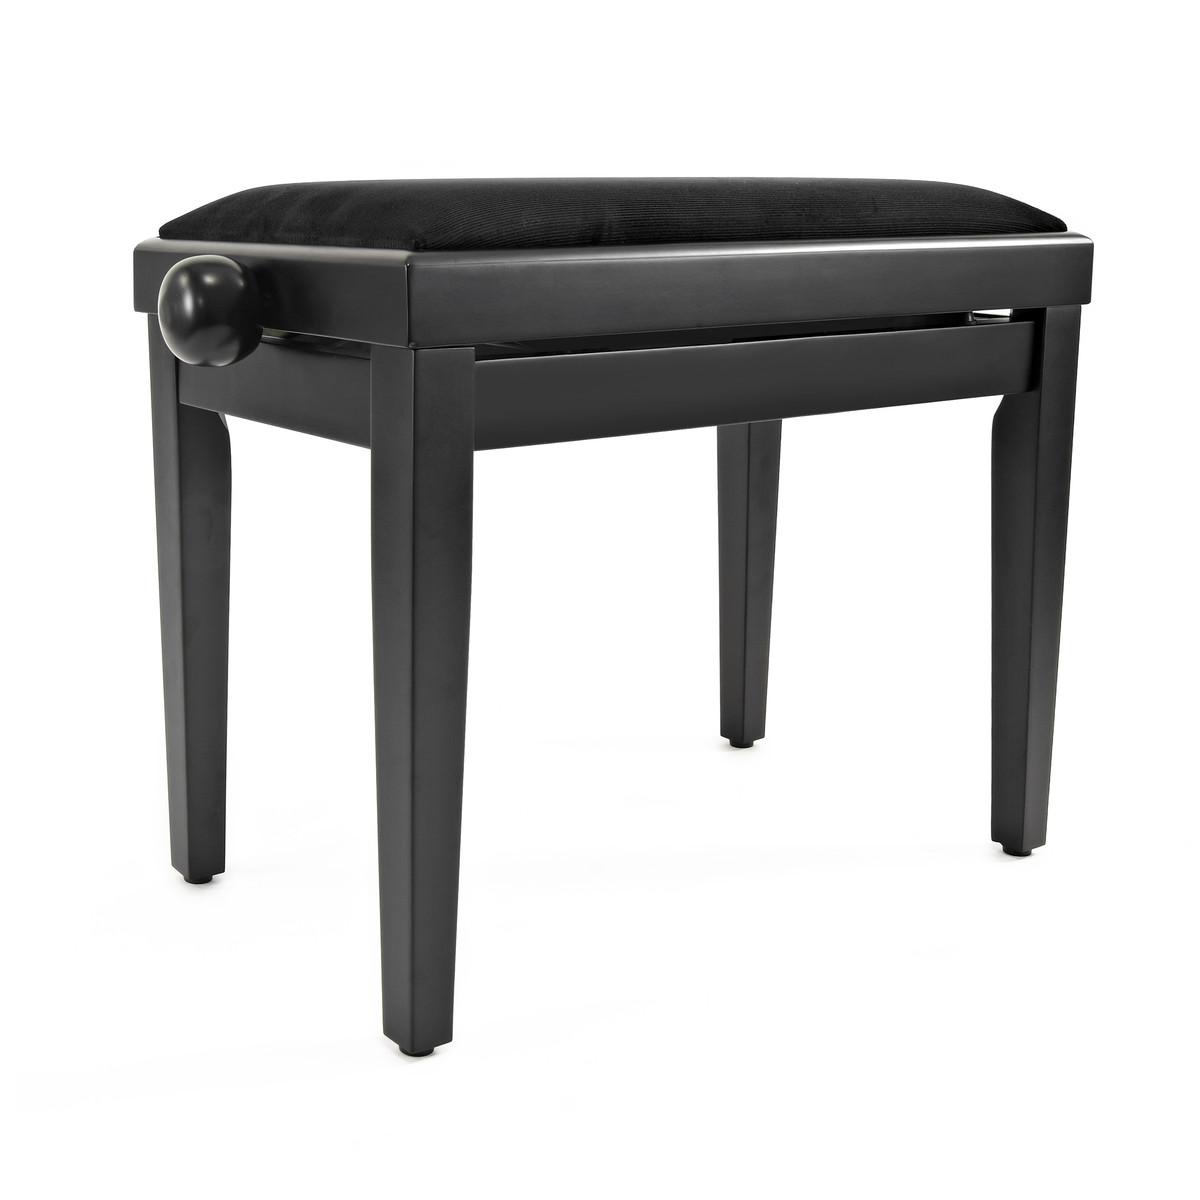 si ge piano r glable par gear4music noir mat comme neuf. Black Bedroom Furniture Sets. Home Design Ideas